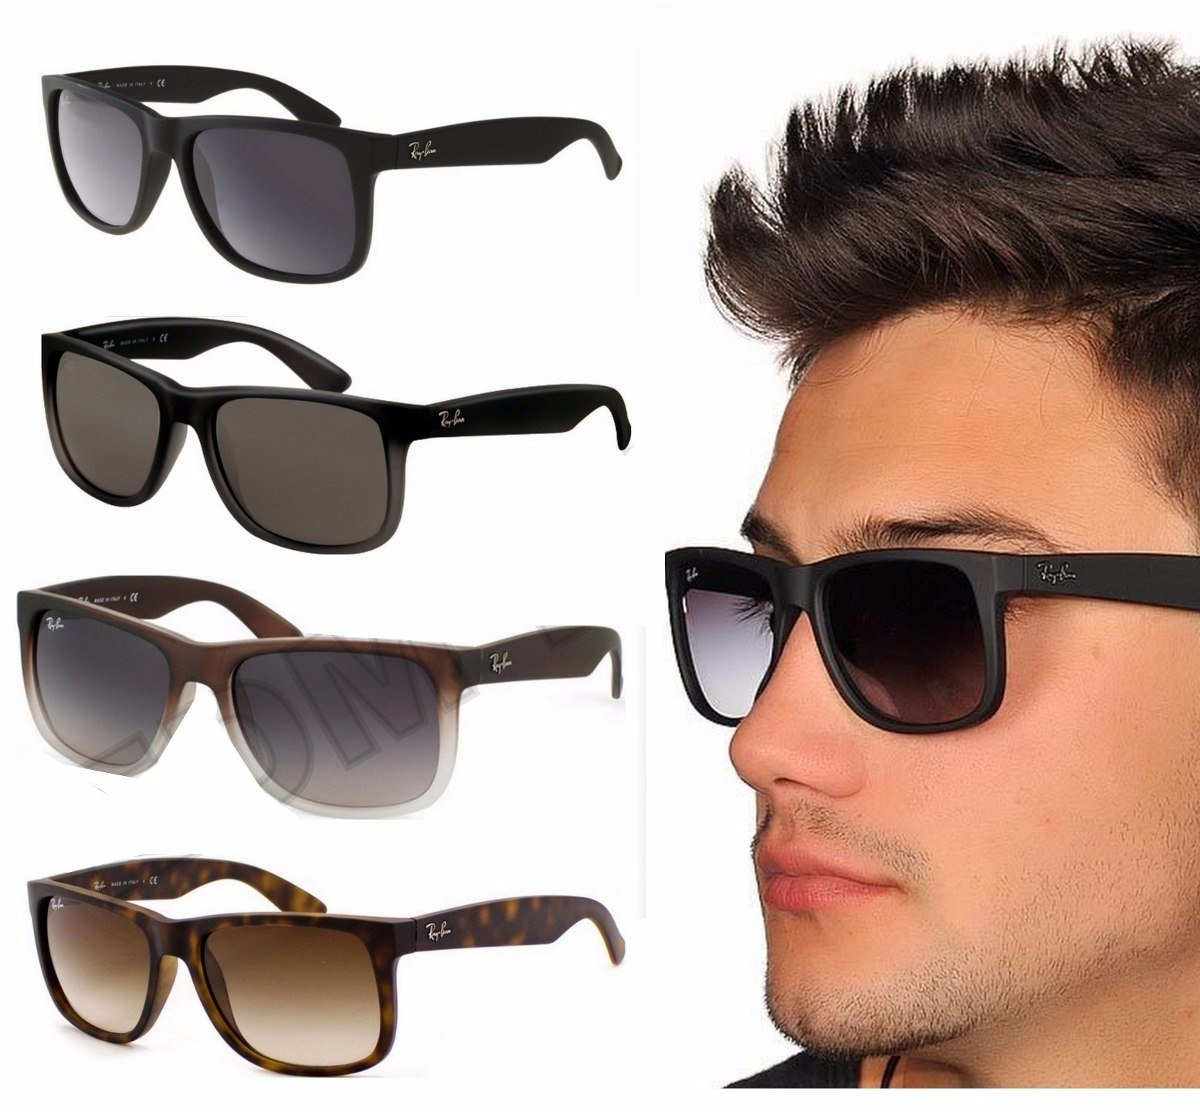 c6616714f3e02 ... purchase anteojos ray ban justin 4165 originales consultar cargando  zoom. a2c23 3421b